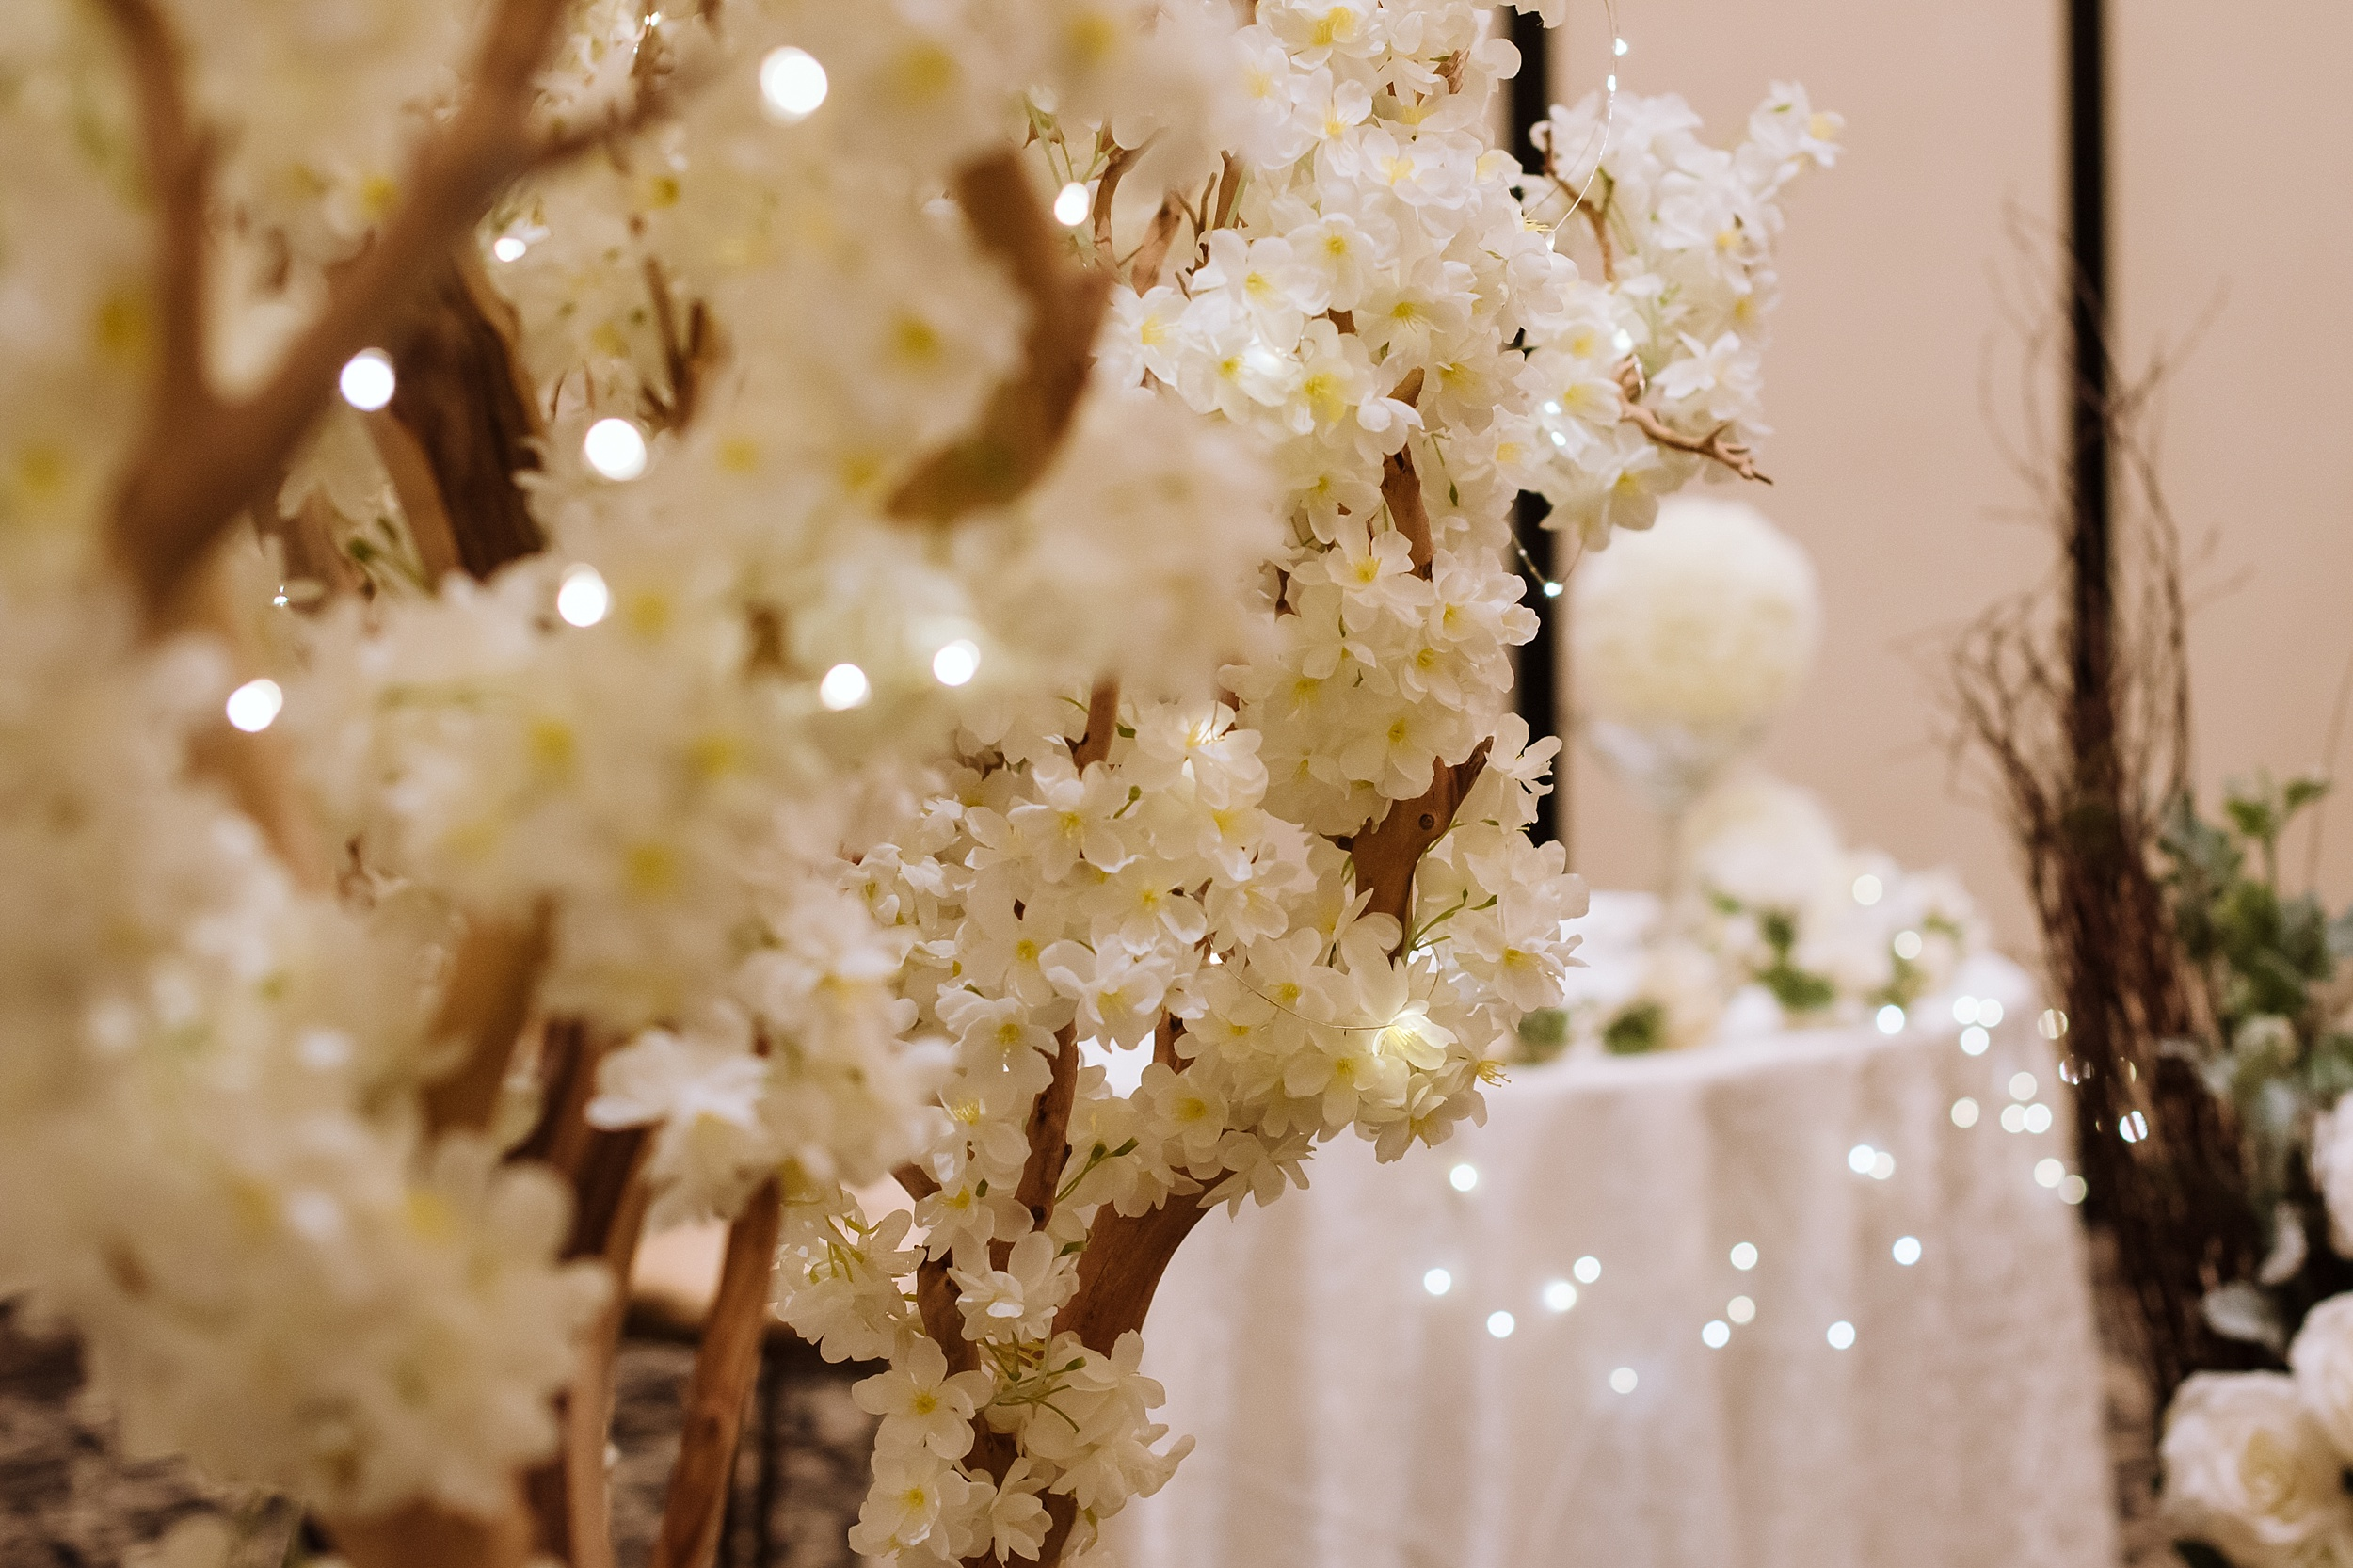 McMichael_Art_Collection_Wedding_chateau_le_jardin_Justine_Munro_Toronto_Photographer045.jpg